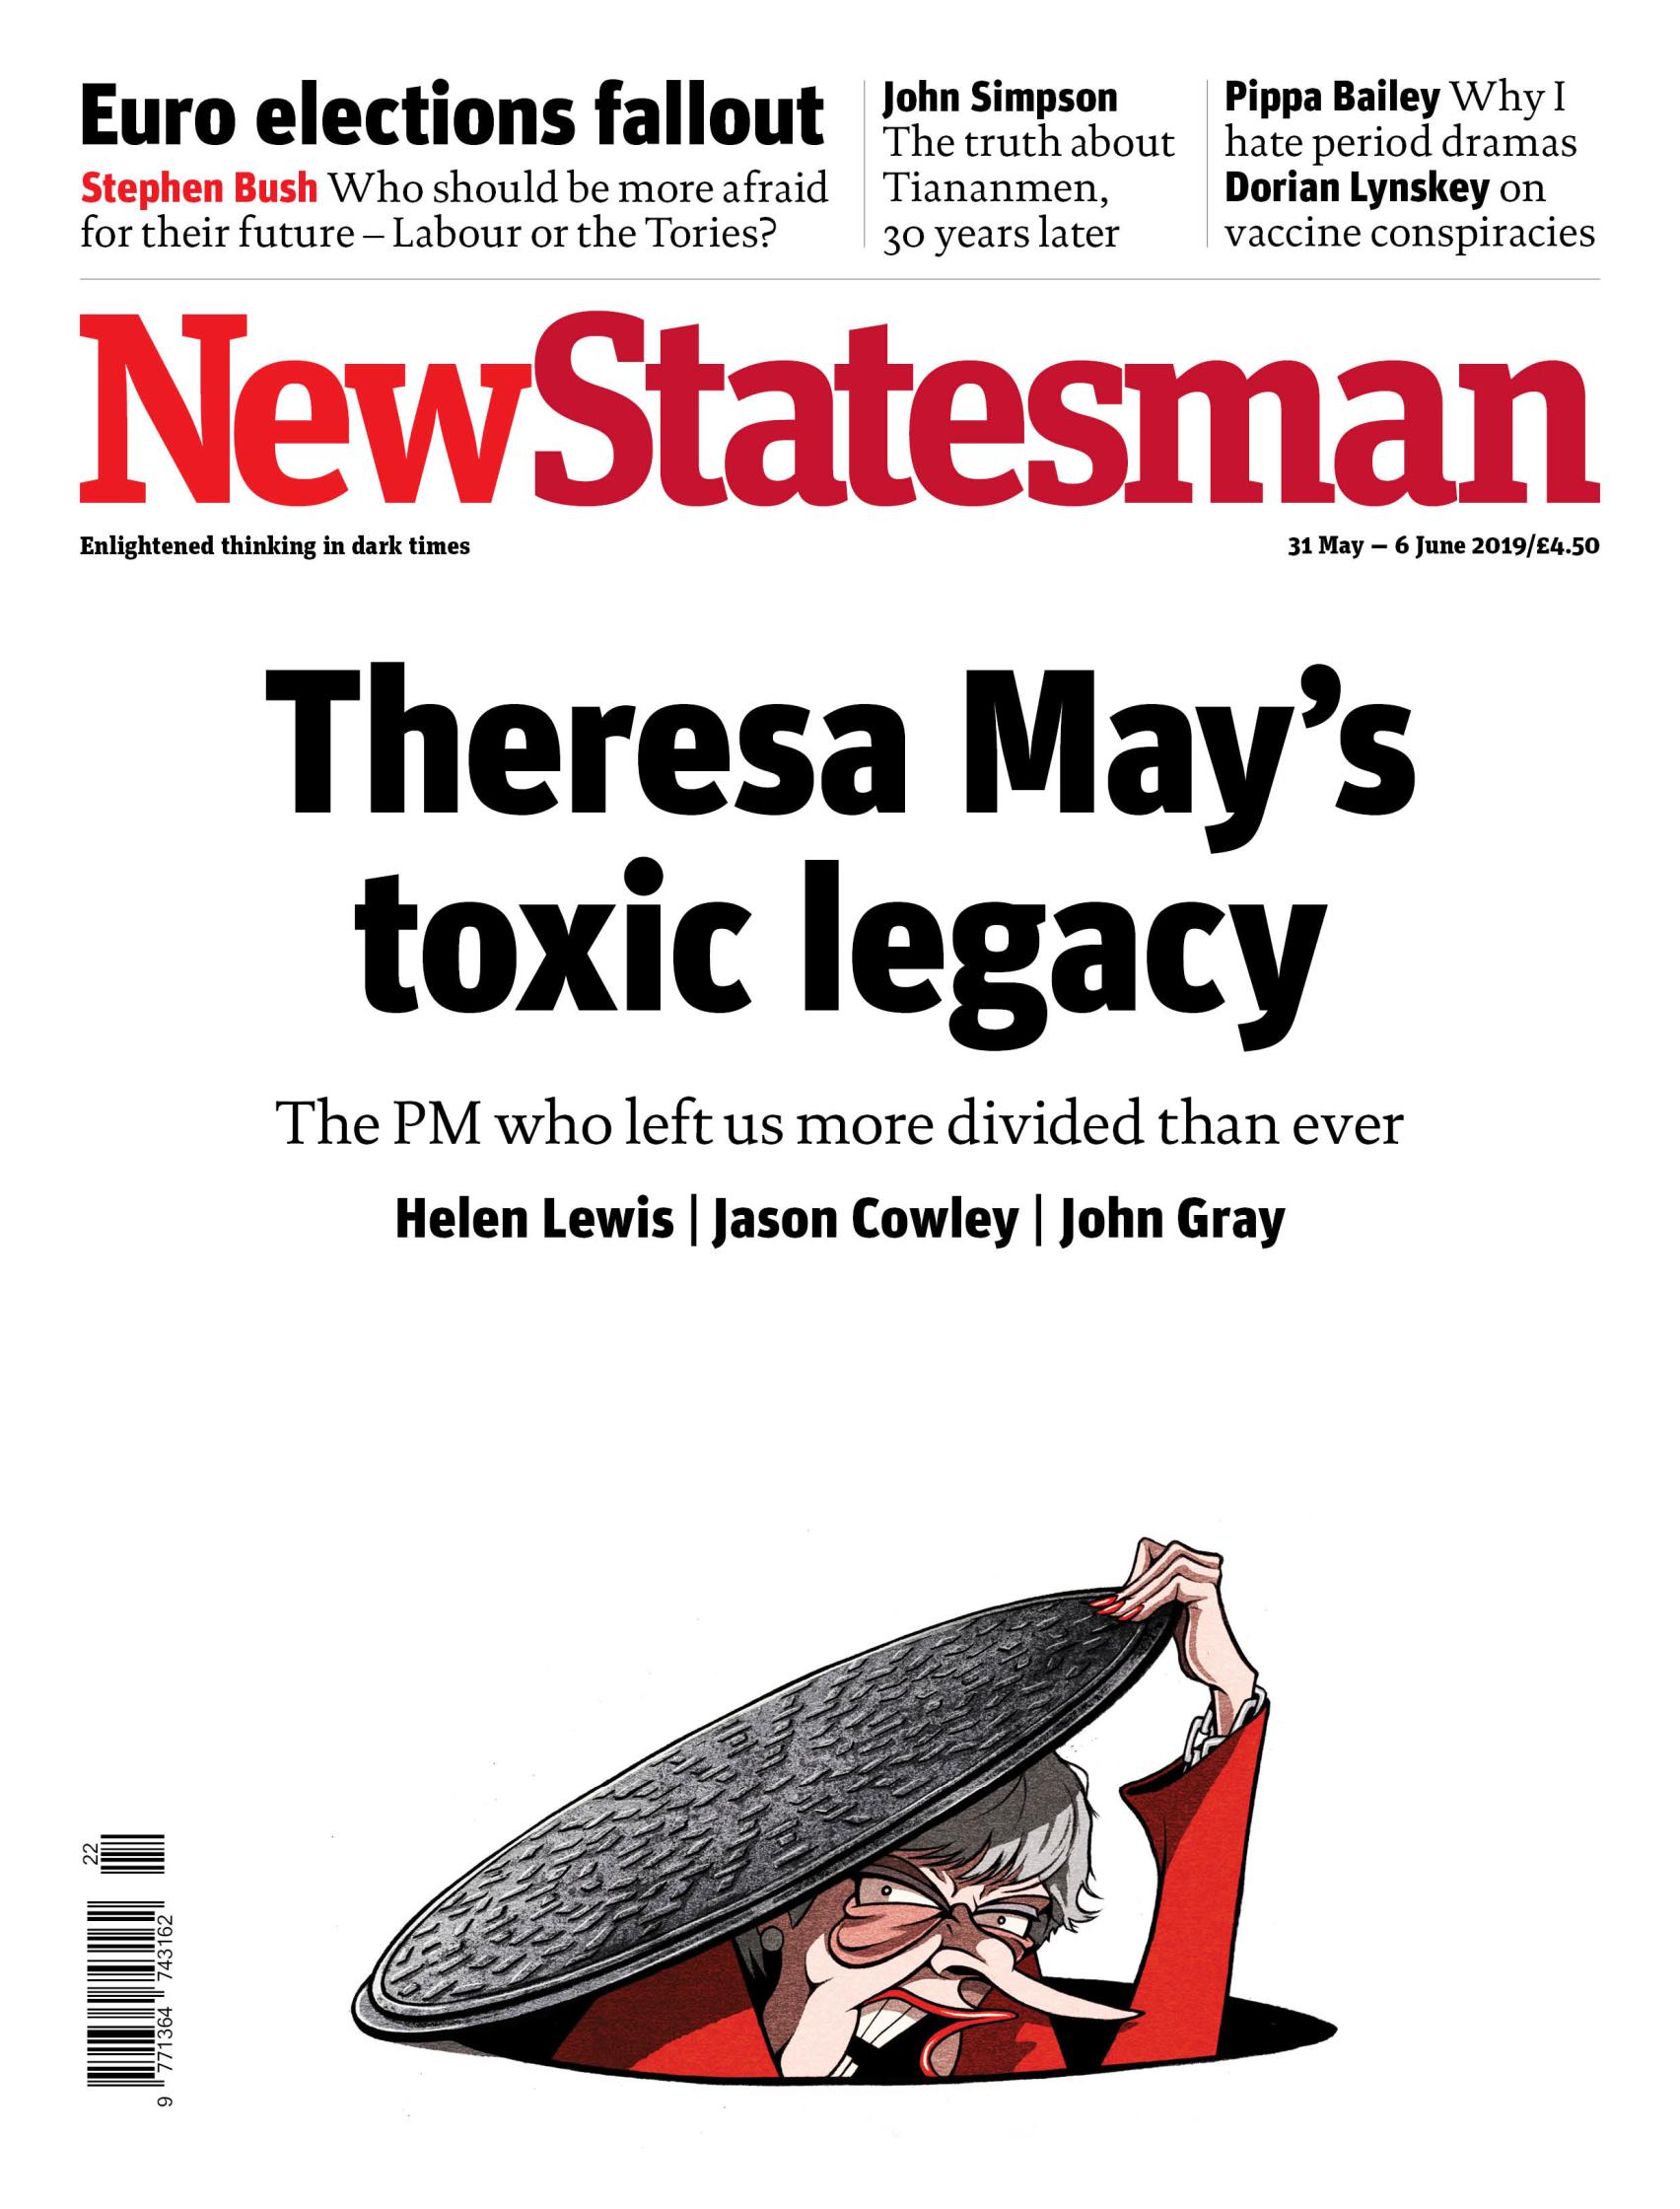 New Statesman | 31May-6June.jpg